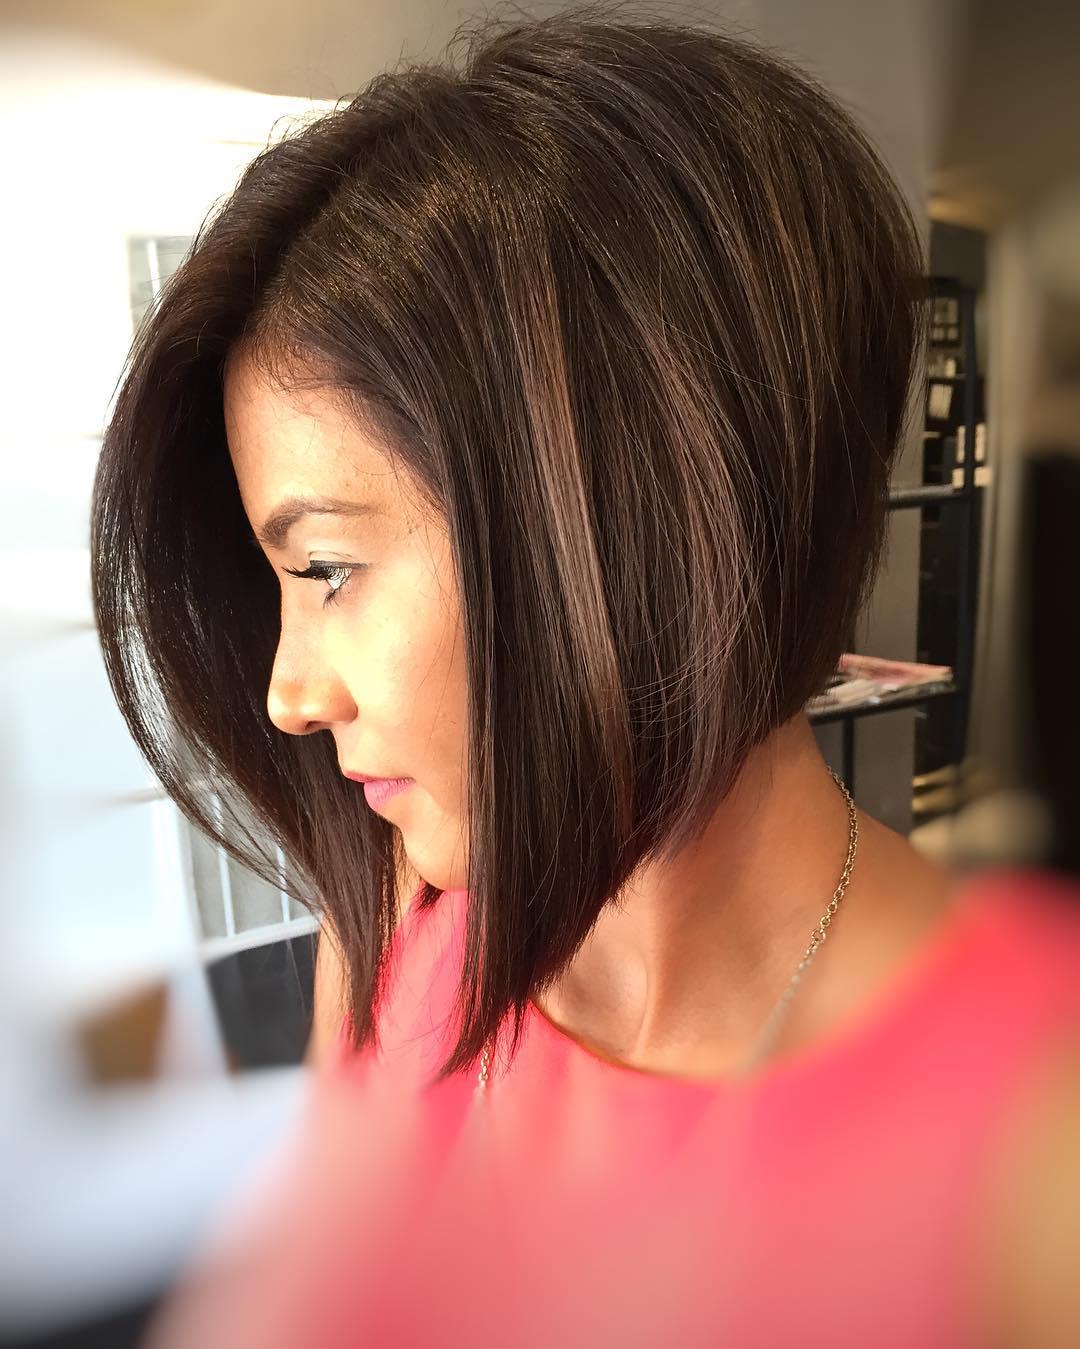 5 Modern Design Ideas For a Stacked Hair Cut